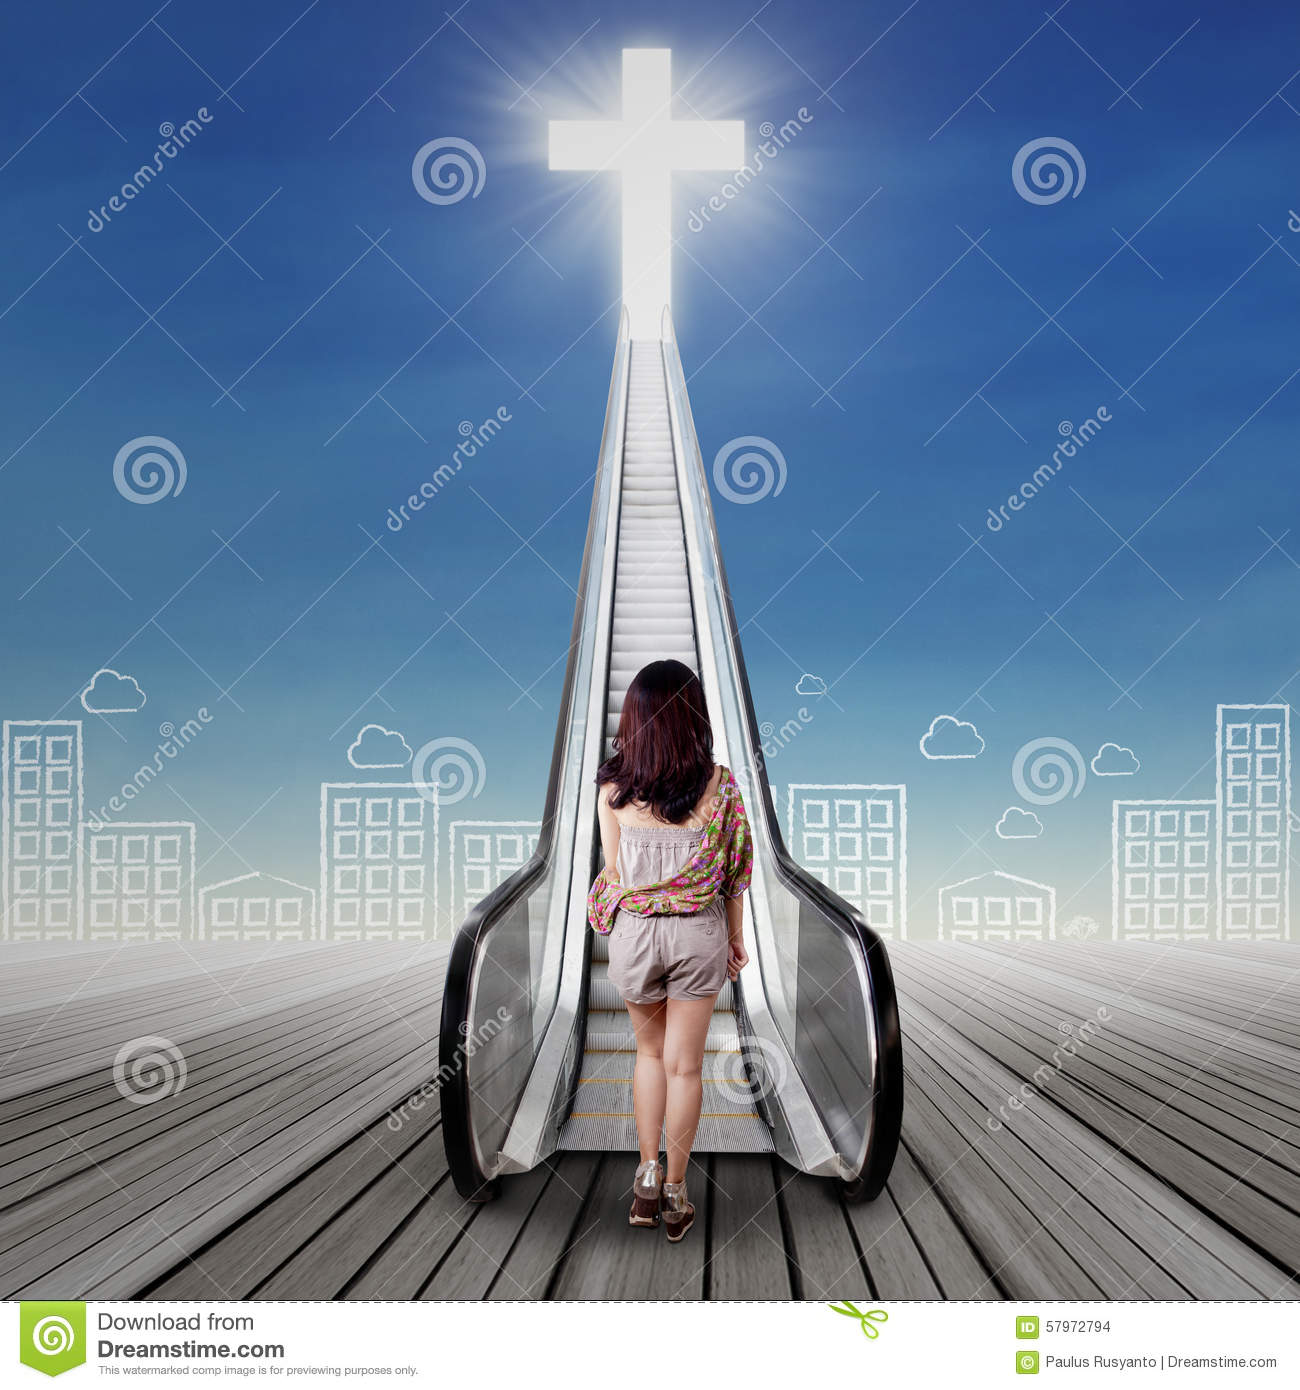 Heaven clipart spiritual Spiritual Clipart doing Journey (20+)